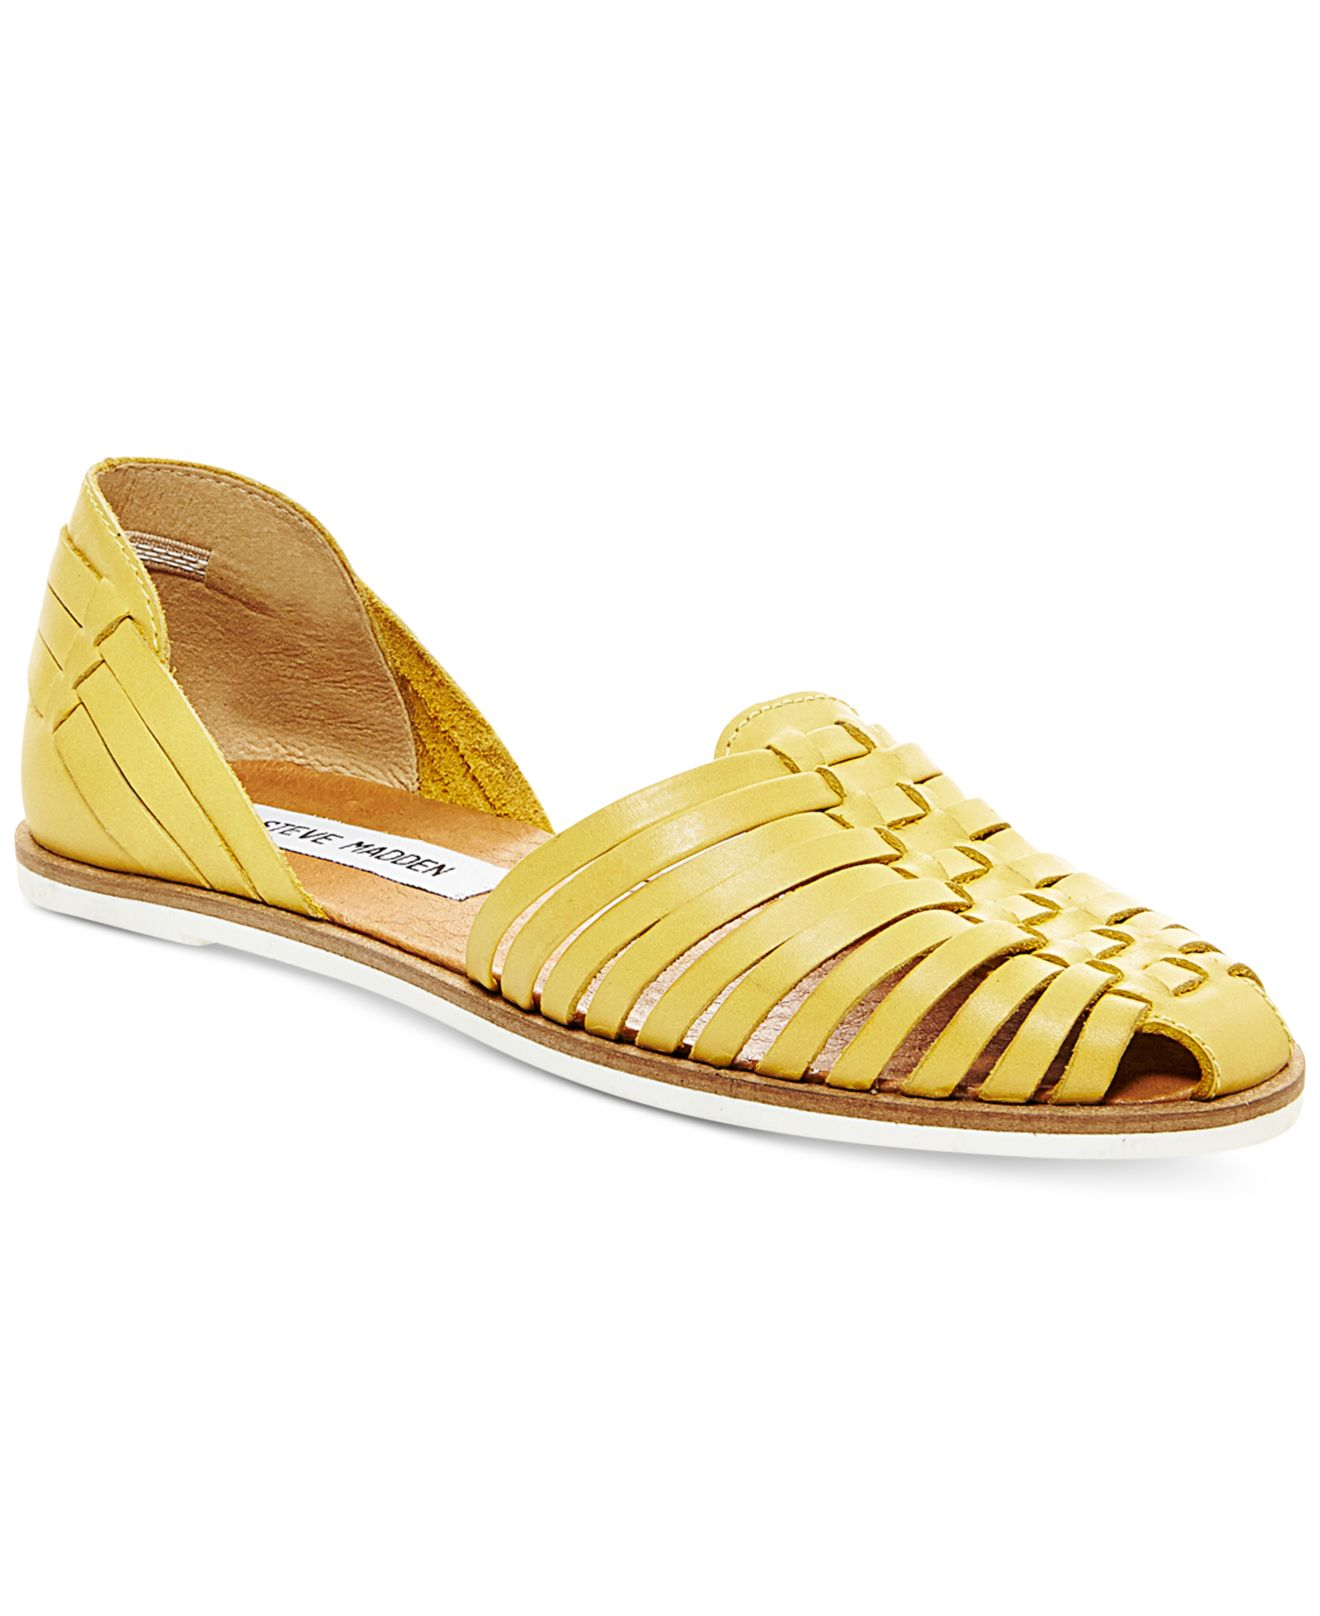 dabd5312c55 Steve Madden Yellow Women's Hillarie Huarache Slip-on Sandals